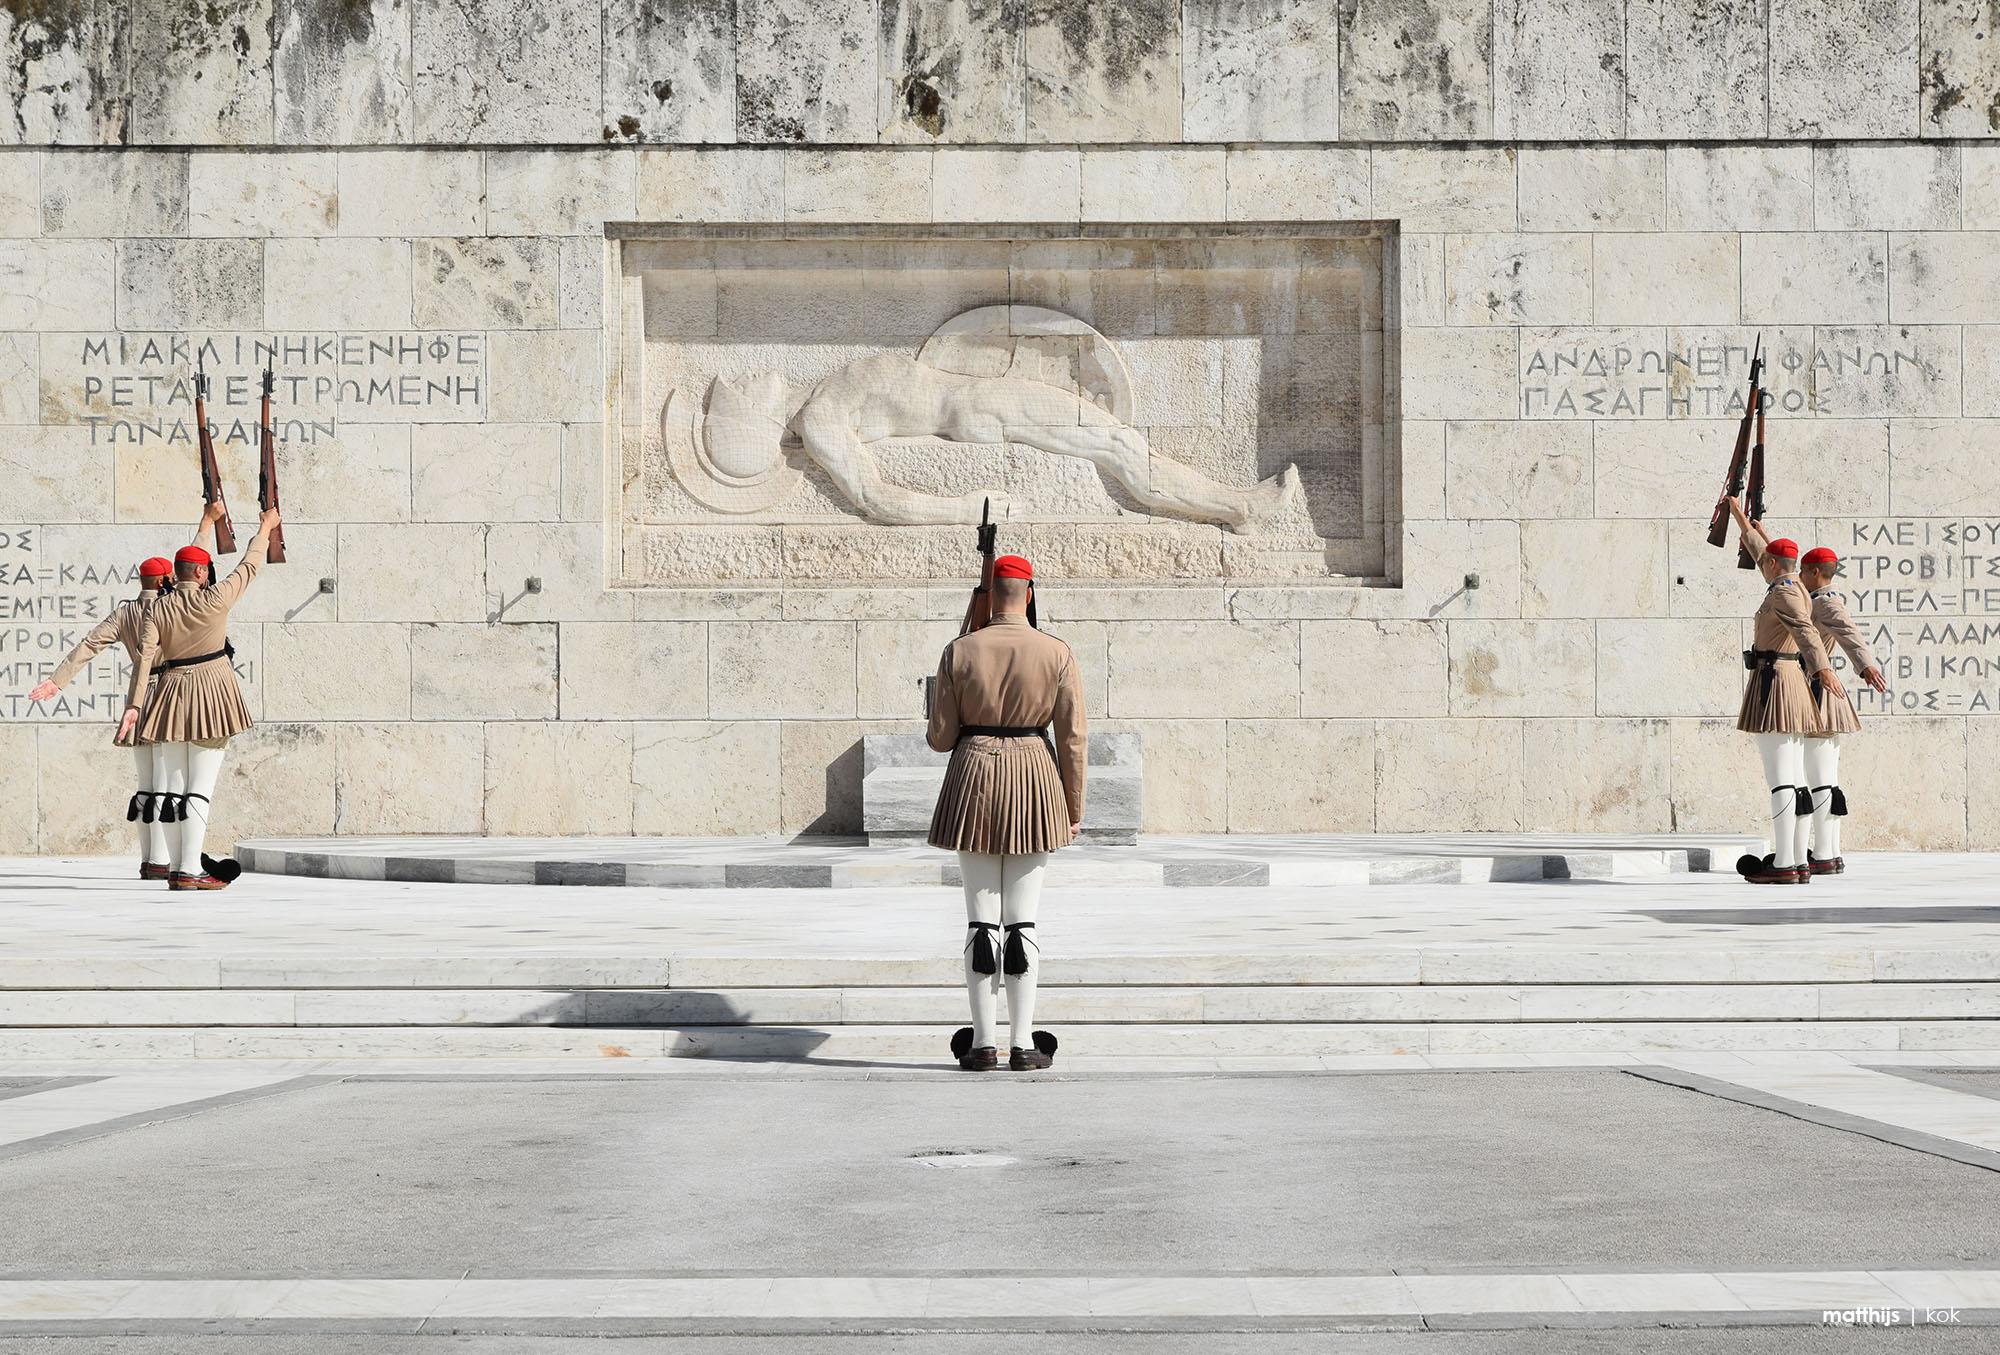 Syntagma Square, Athens, Greece | Photo by Matthijs Kok